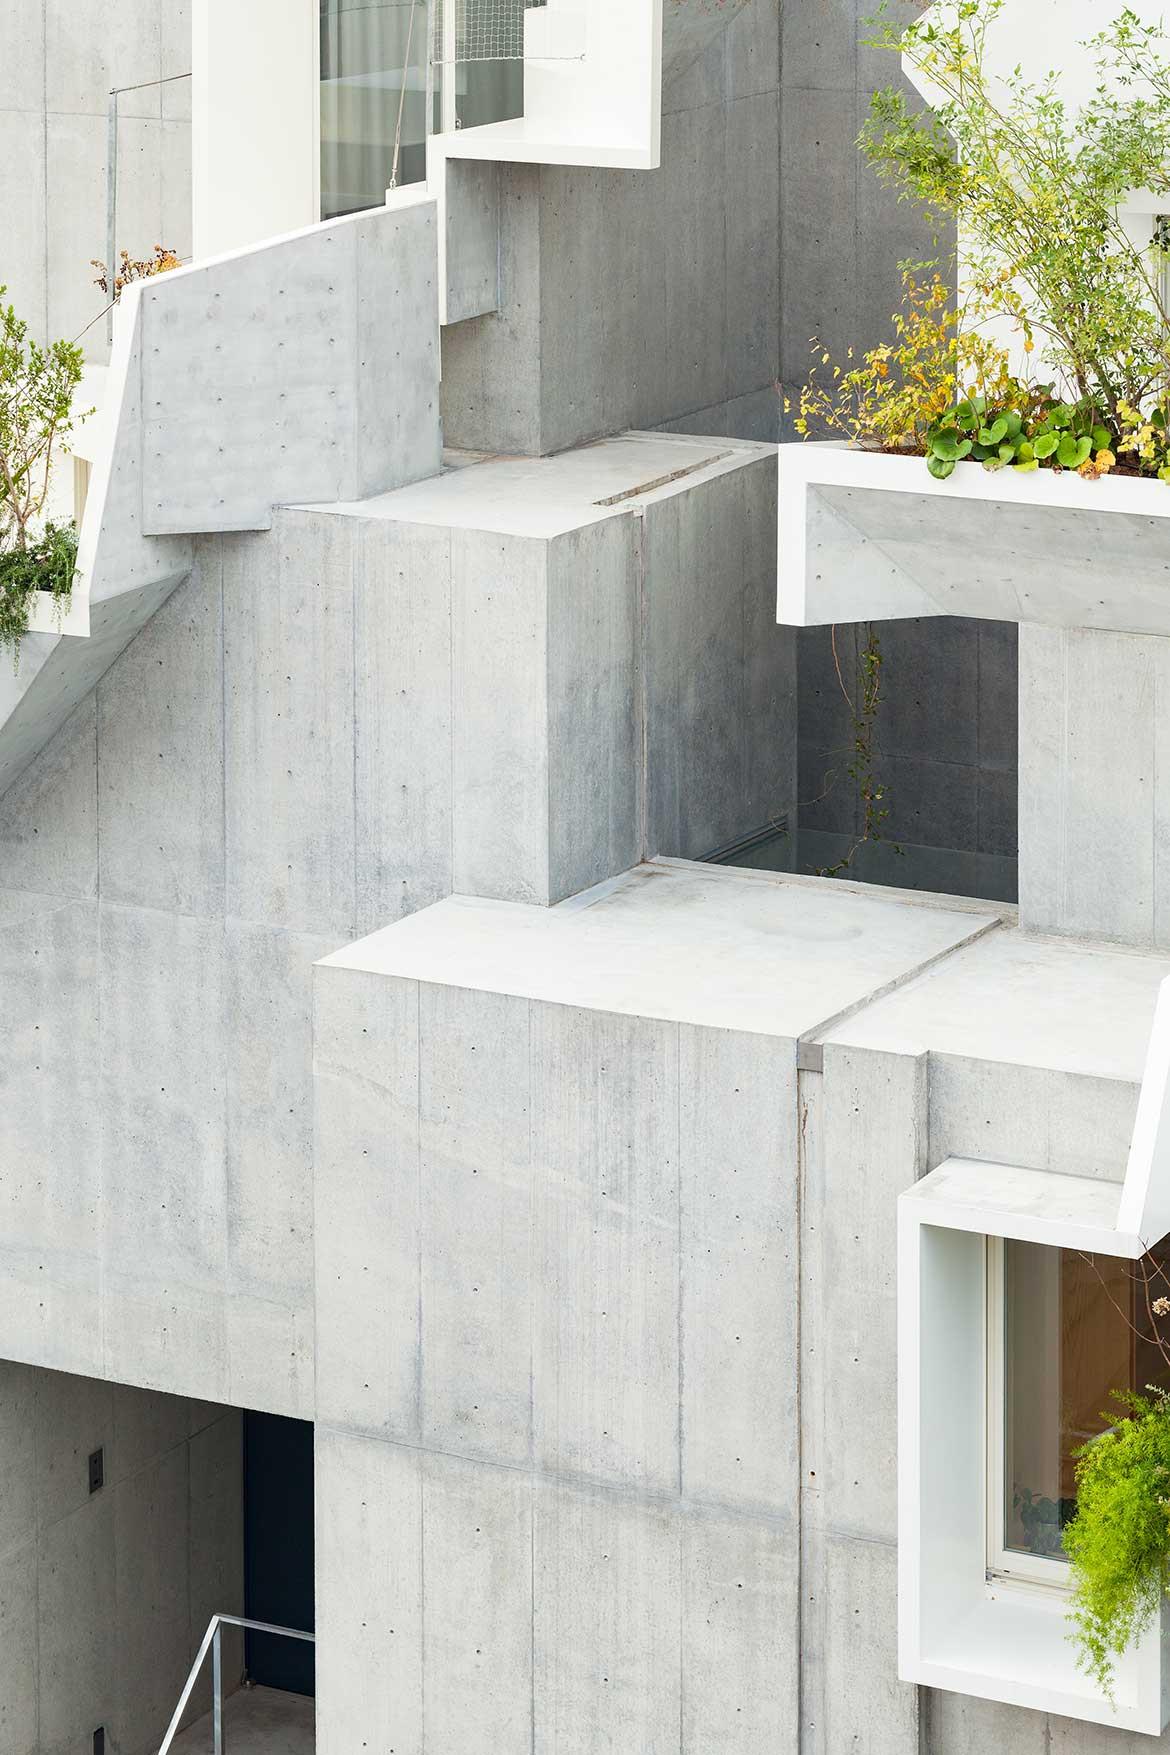 Tree-ness House Akihisa Hirata cc Vincent Hecht concrete exterior